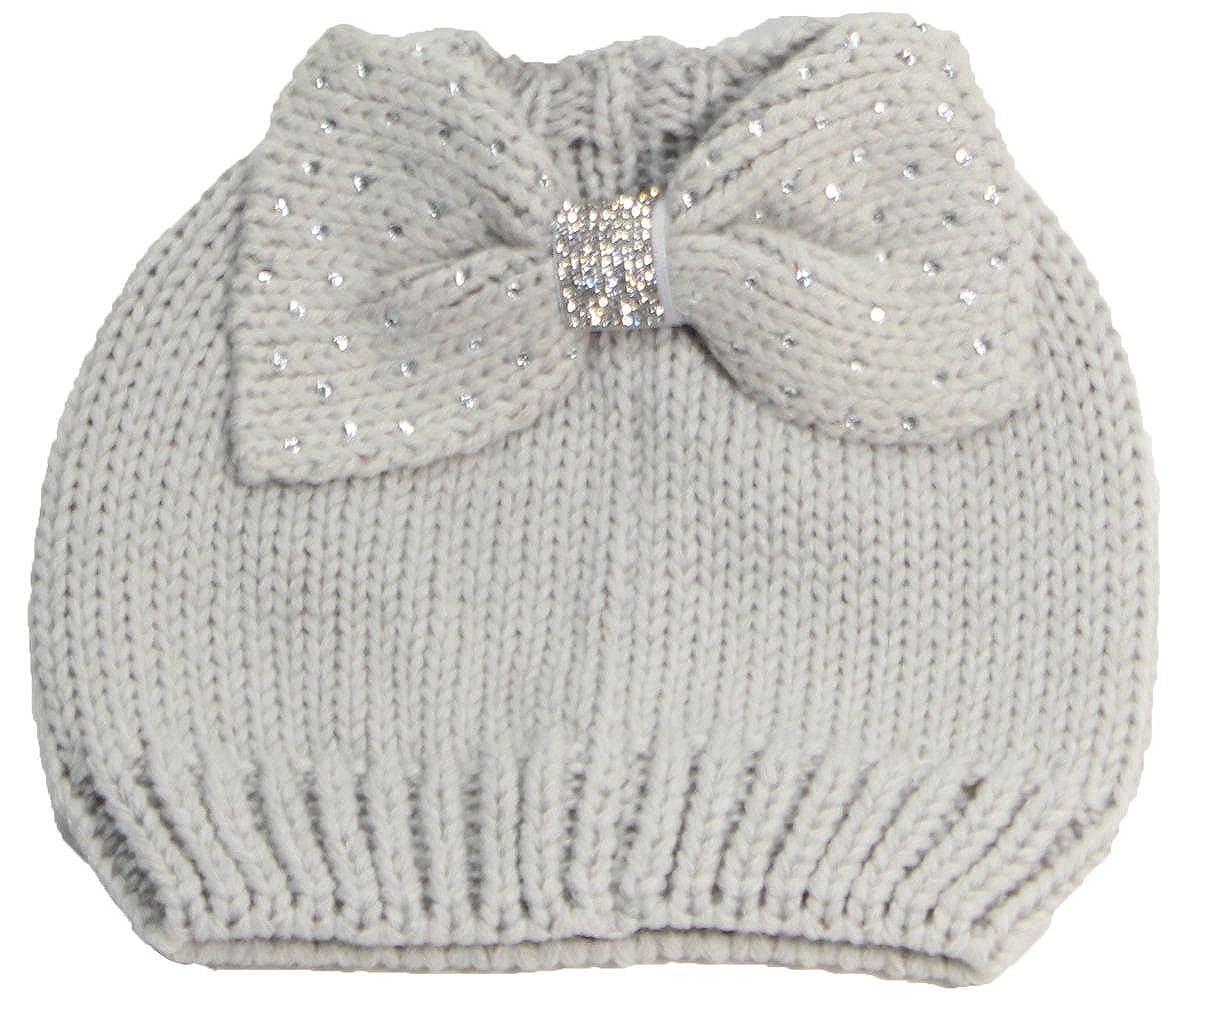 50f434625e2 Best Winter Hats Womens Messy Bun Ponytail Beanie W Jeweled Bow - Light  Gray at Amazon Women s Clothing store